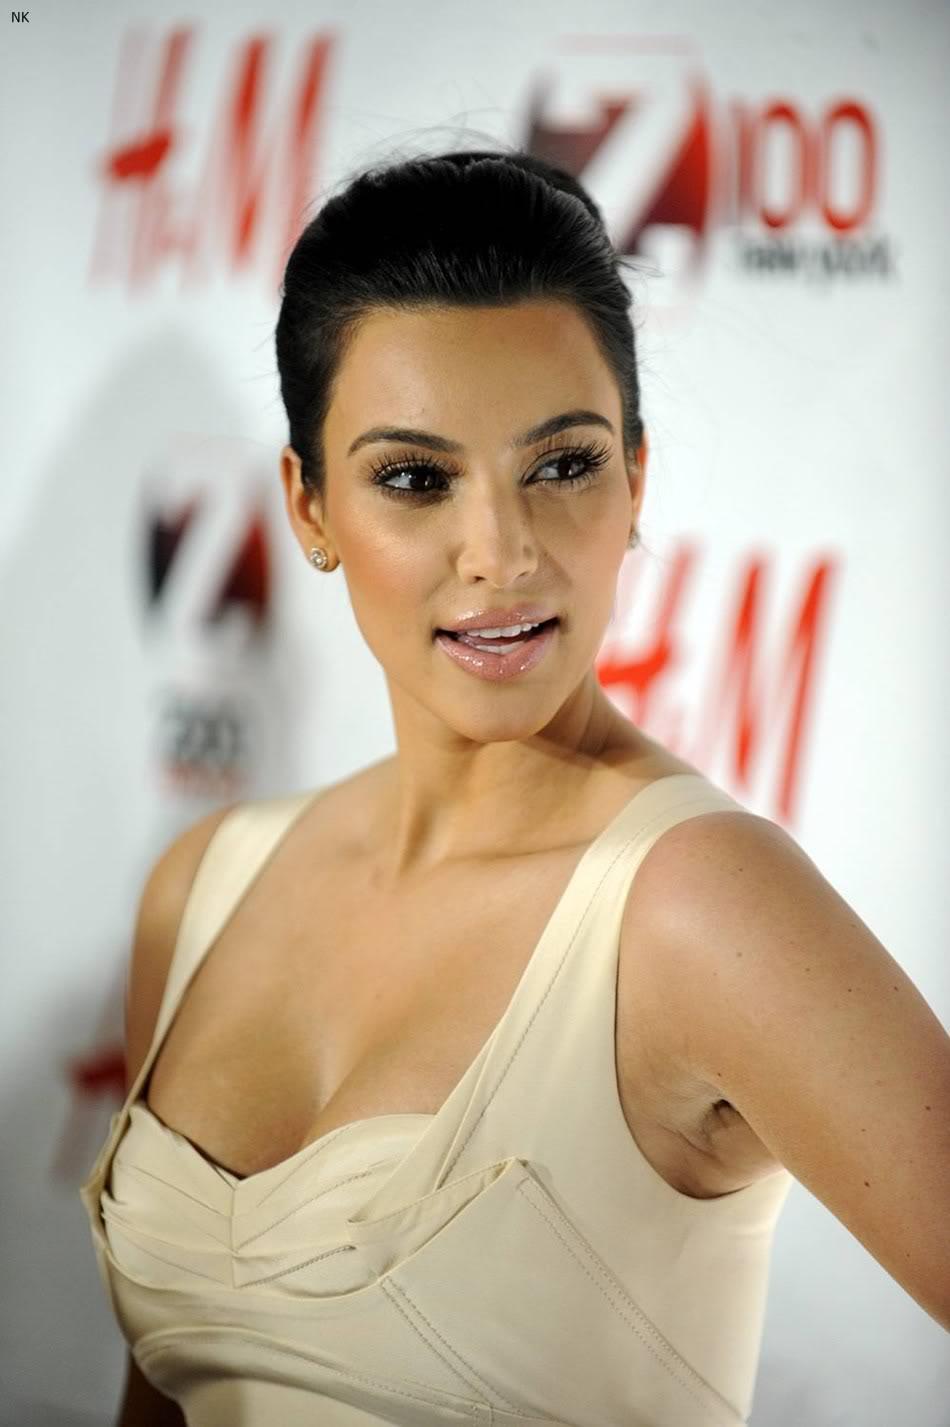 http://3.bp.blogspot.com/-ZIr8XYC5pYY/TbS466_dovI/AAAAAAAADu8/MyF6evYltkw/s1600/kim_kardashian_dress%2B%25289%2529.jpg